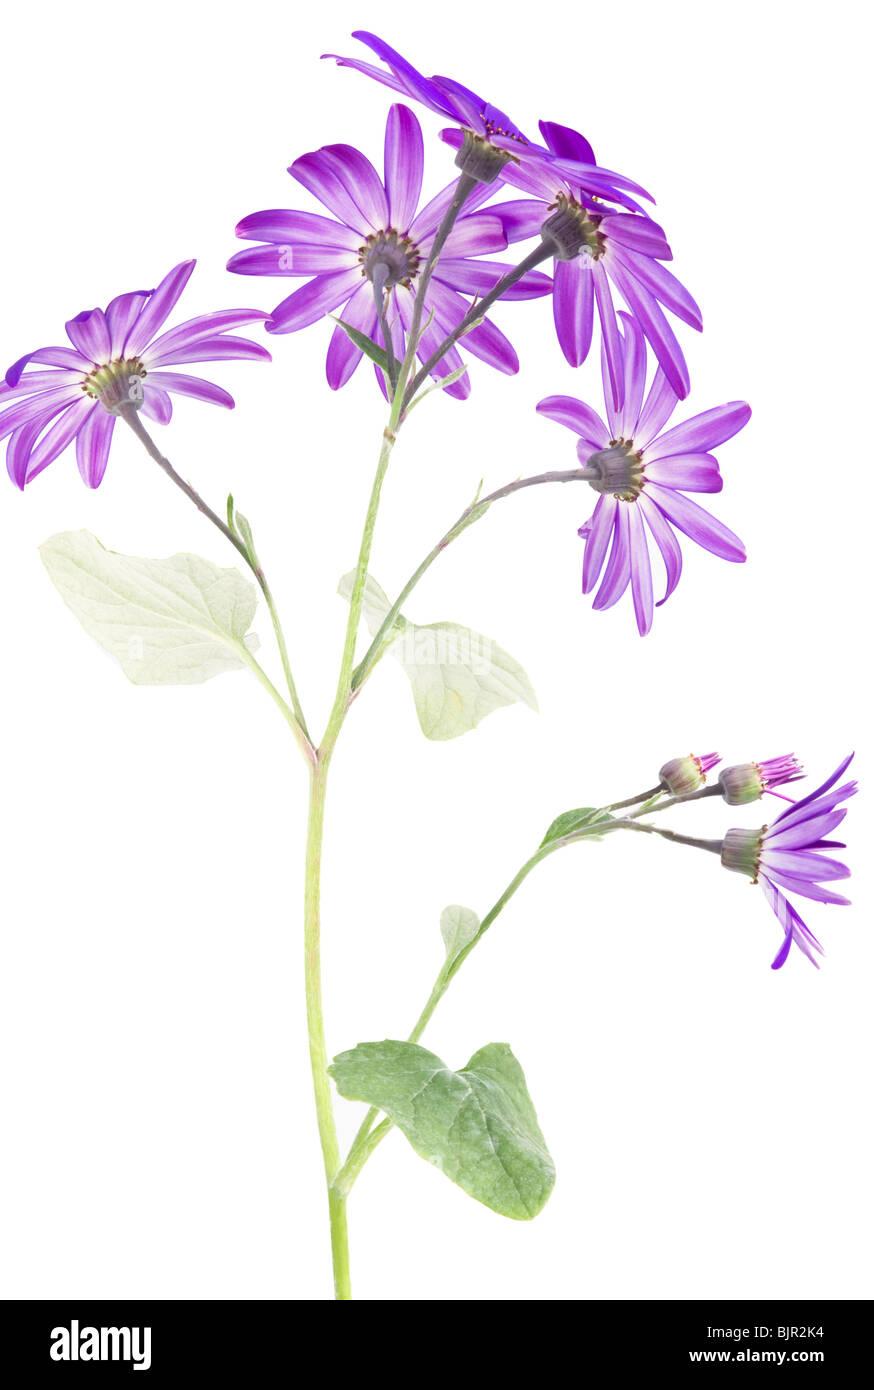 The Underside of a Deep Blue Senetti Flower (var.sunsenedibu pericallis hybrids) Against a White Background - Stock Image